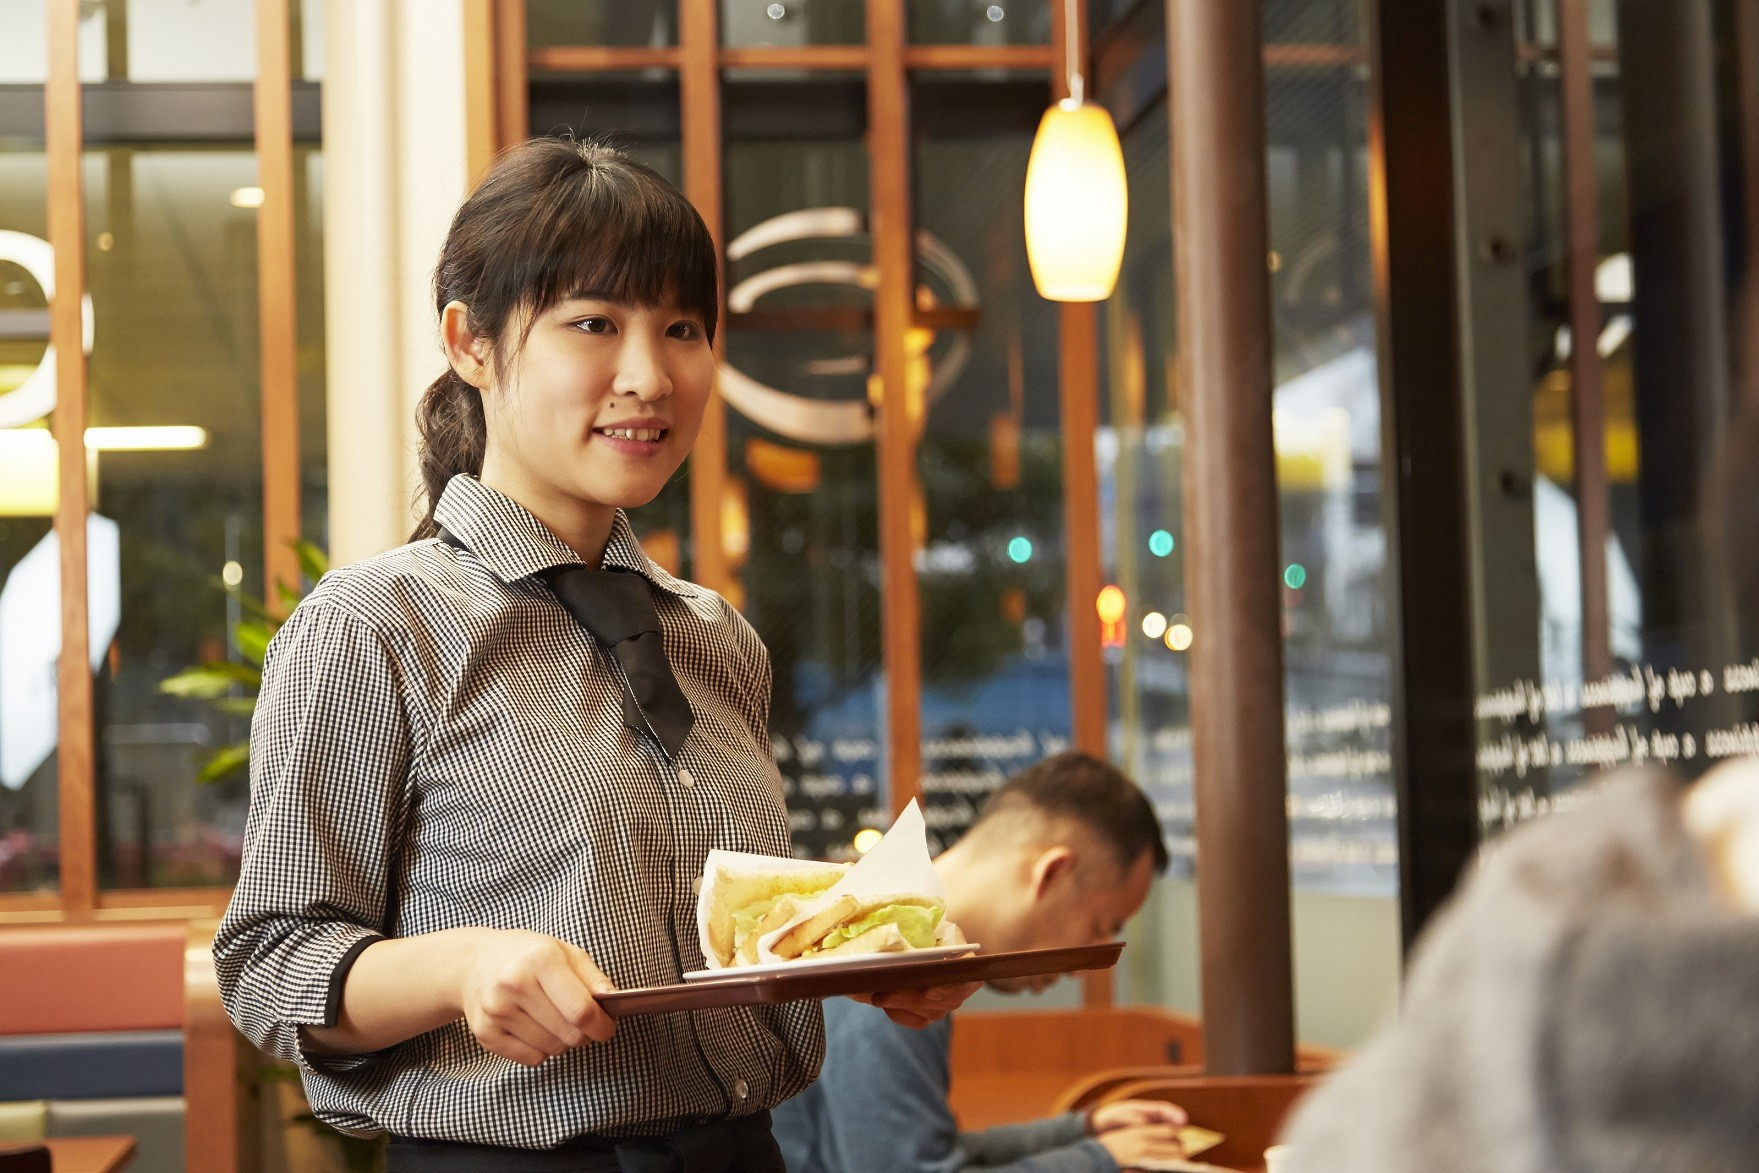 CAFE de CRIE(カフェ・ド・クリエ) 日本橋人形町 のアルバイト情報